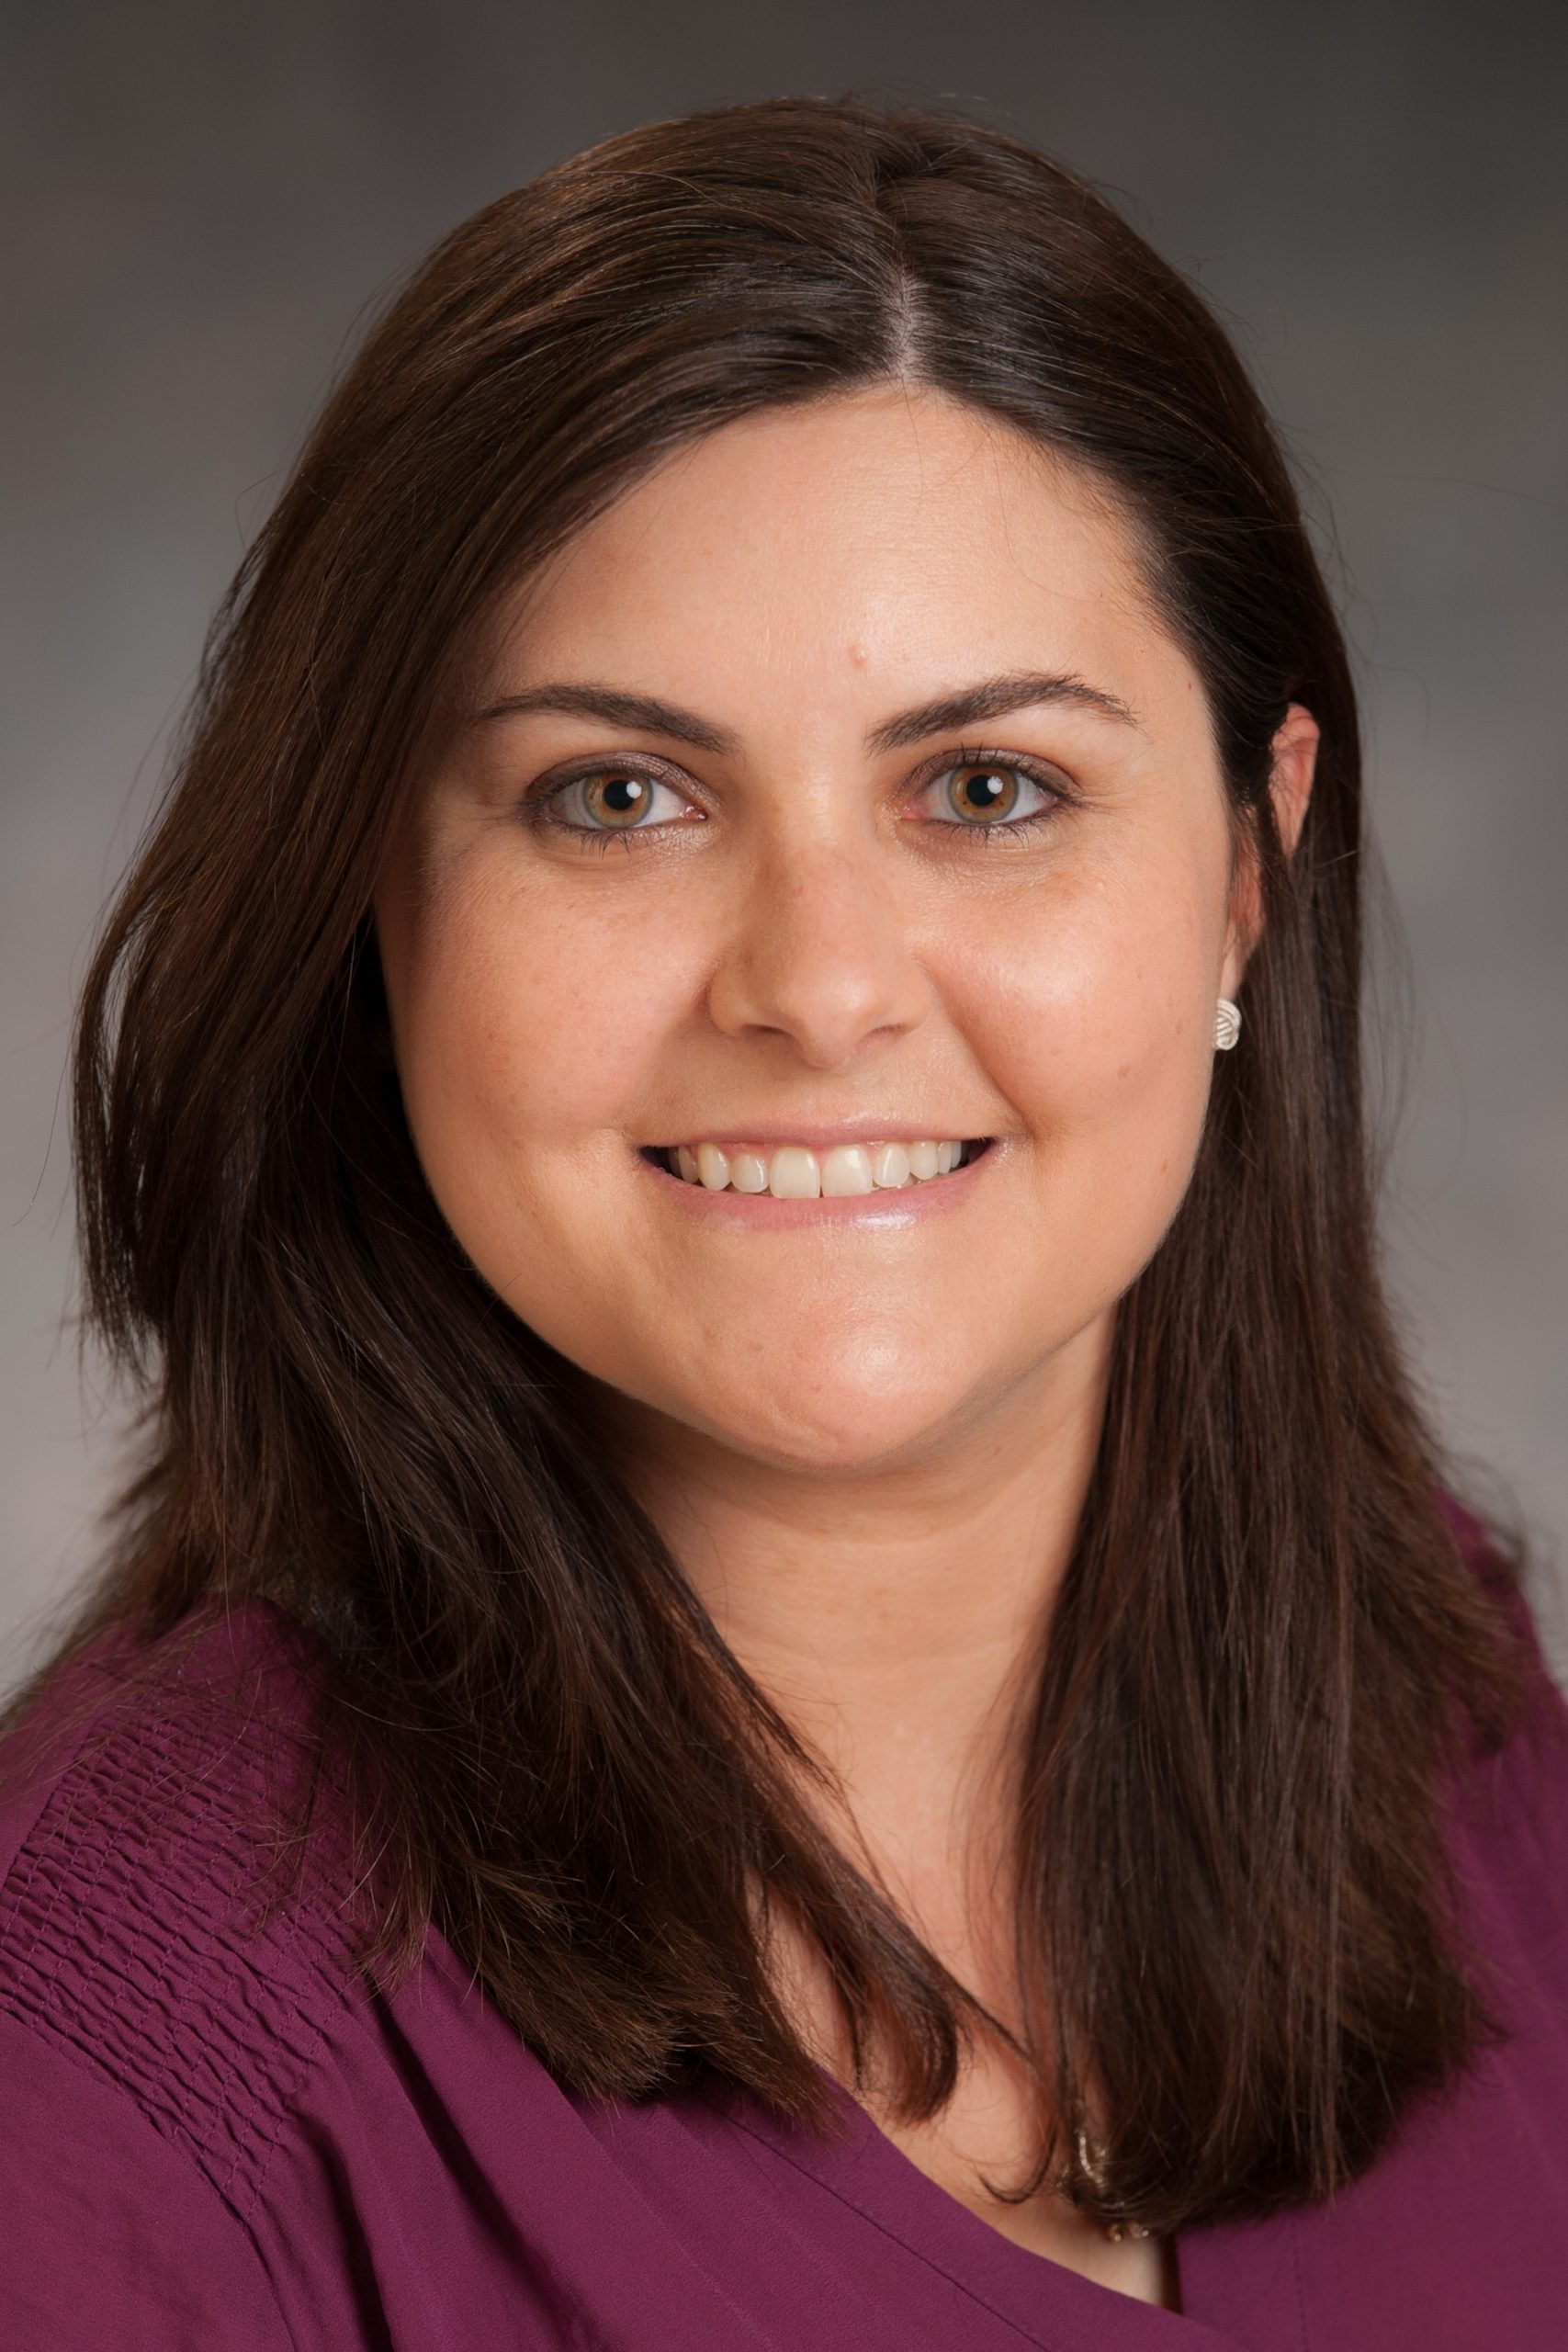 Heloisa Prado Soares, M.D., Ph.D.